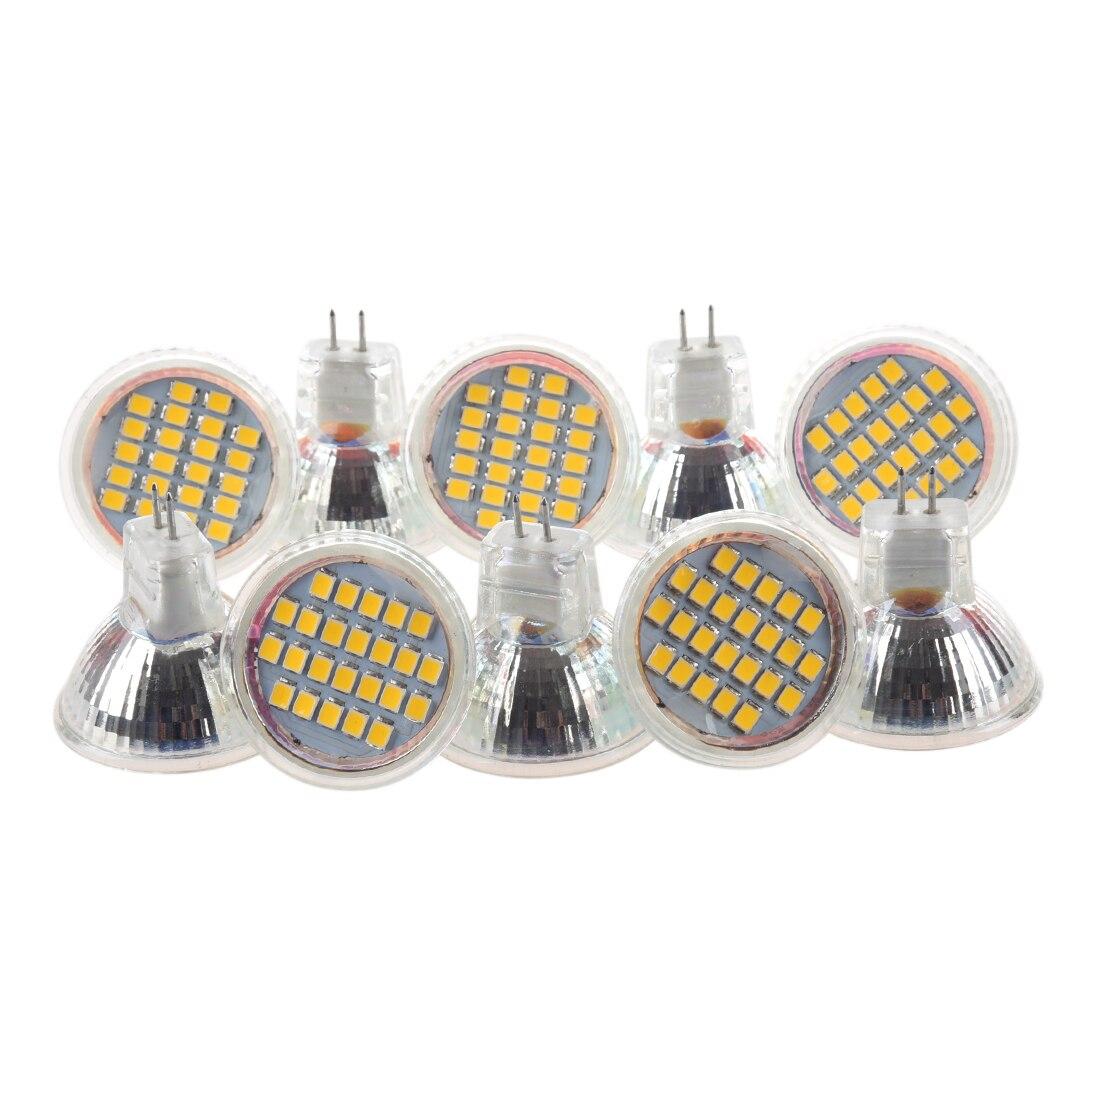 10 Uds MR11 GU4 blanco cálido 3528 SMD 24 LED Home Spotlight bombilla 1W 12V E32-915T30D Lora de largo alcance UART SX1276 915mhz 1W SMA antena IoT uhf transceptor inalámbrico módulo receptor